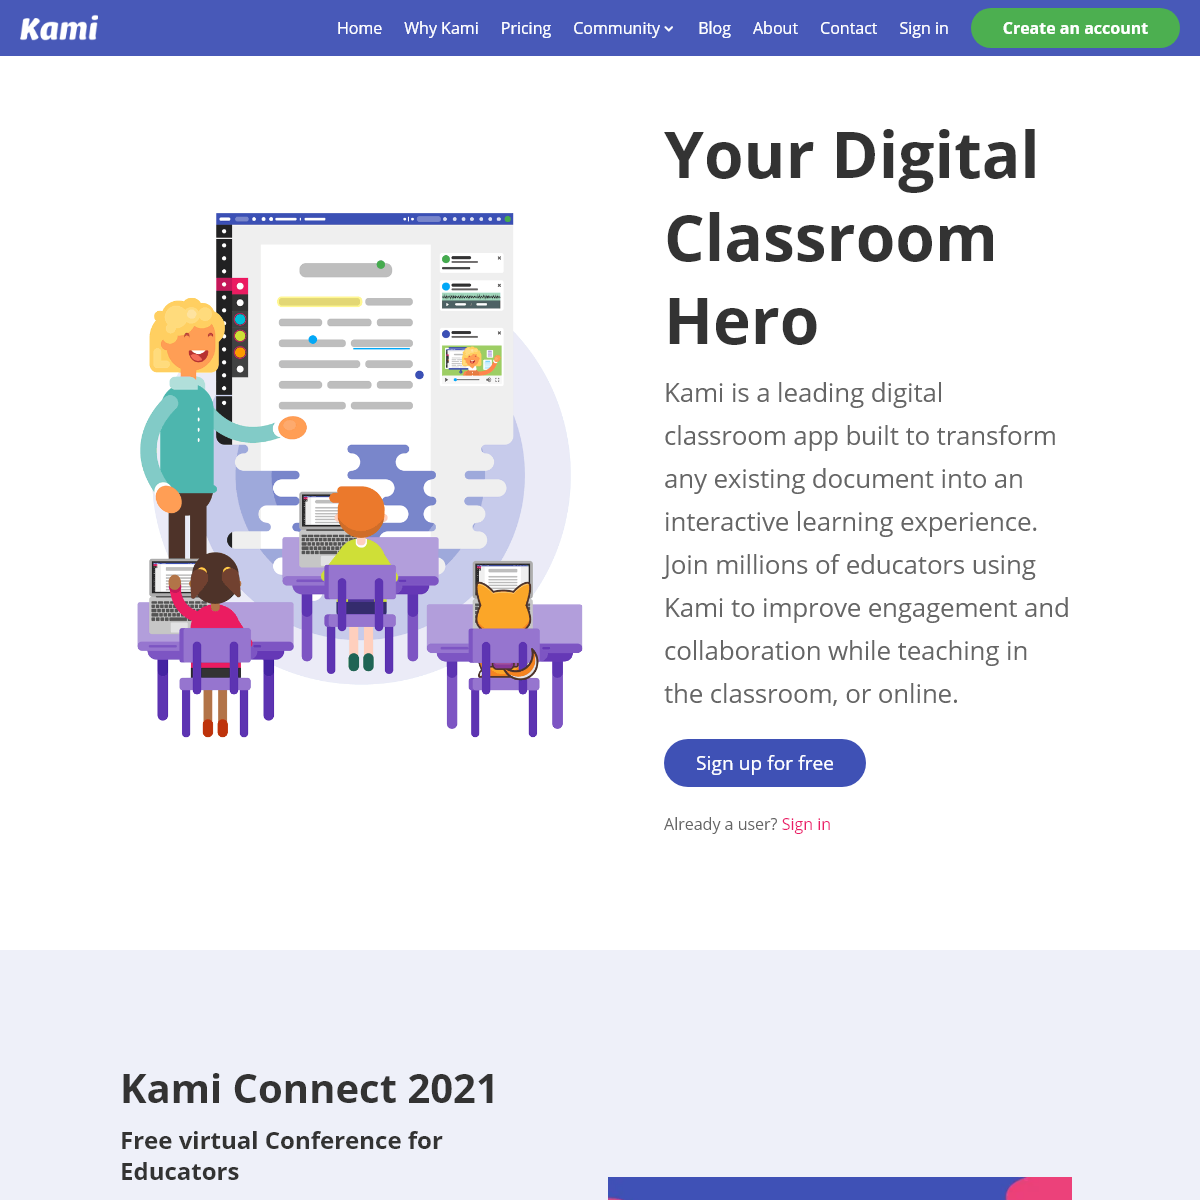 Kami - Your Digital Classroom Hero